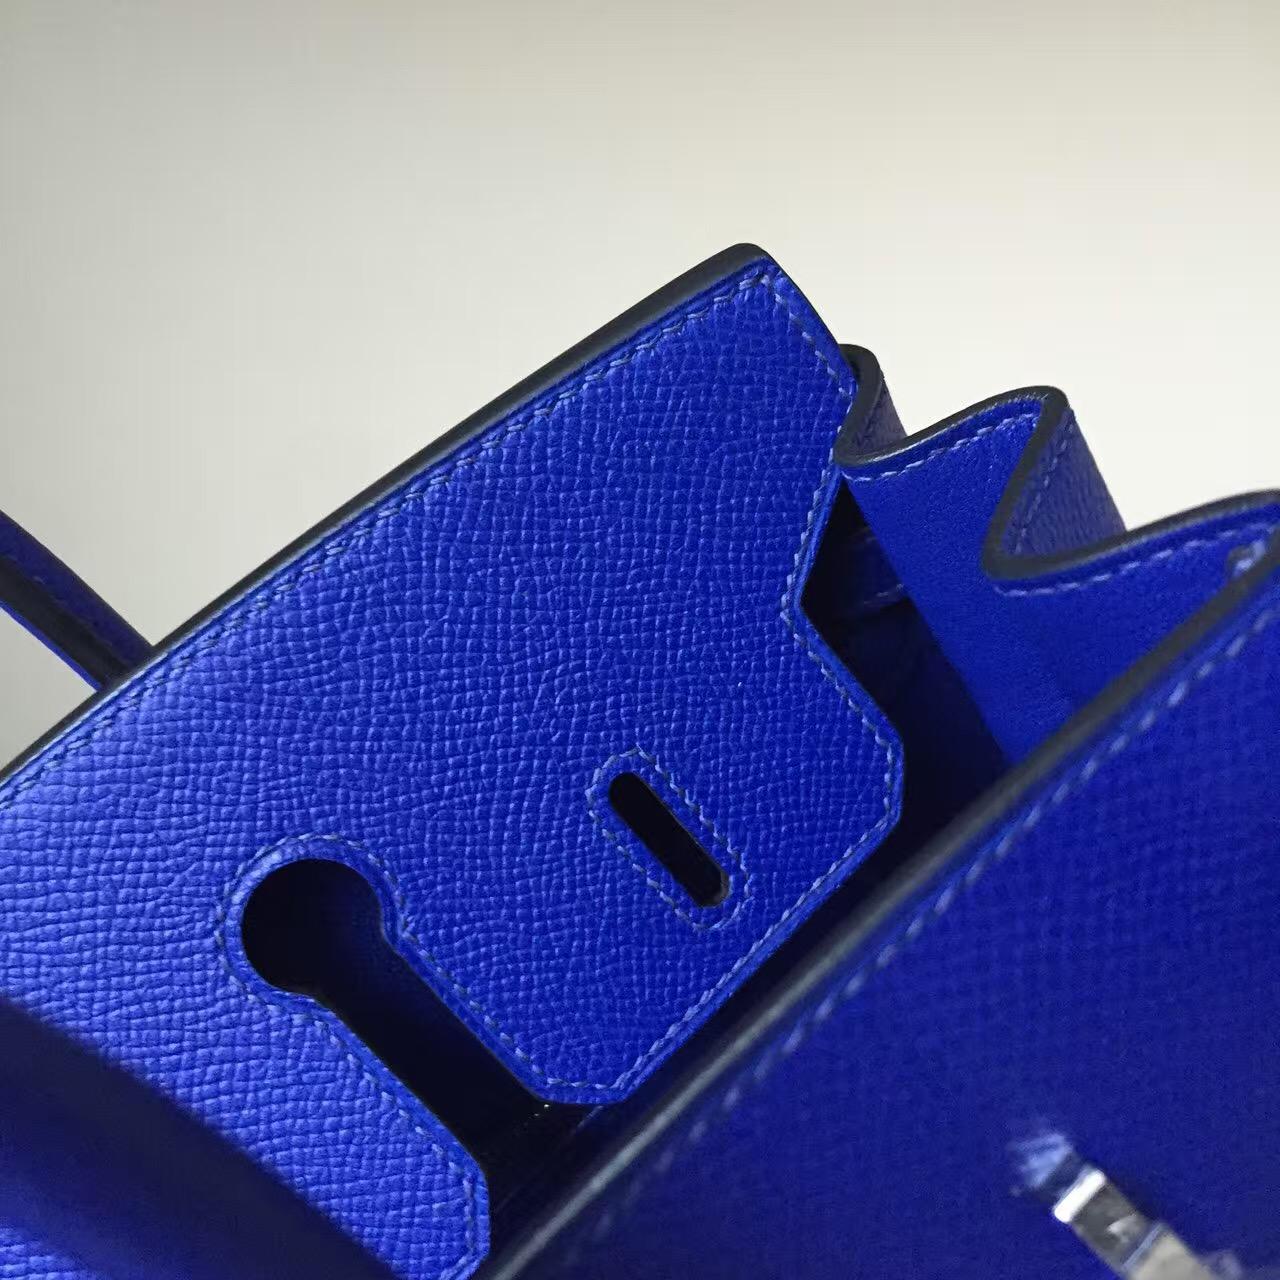 Sale Hermes 7T Blue Electric Epsom Calfskin Leather Birkin Bag 25cm